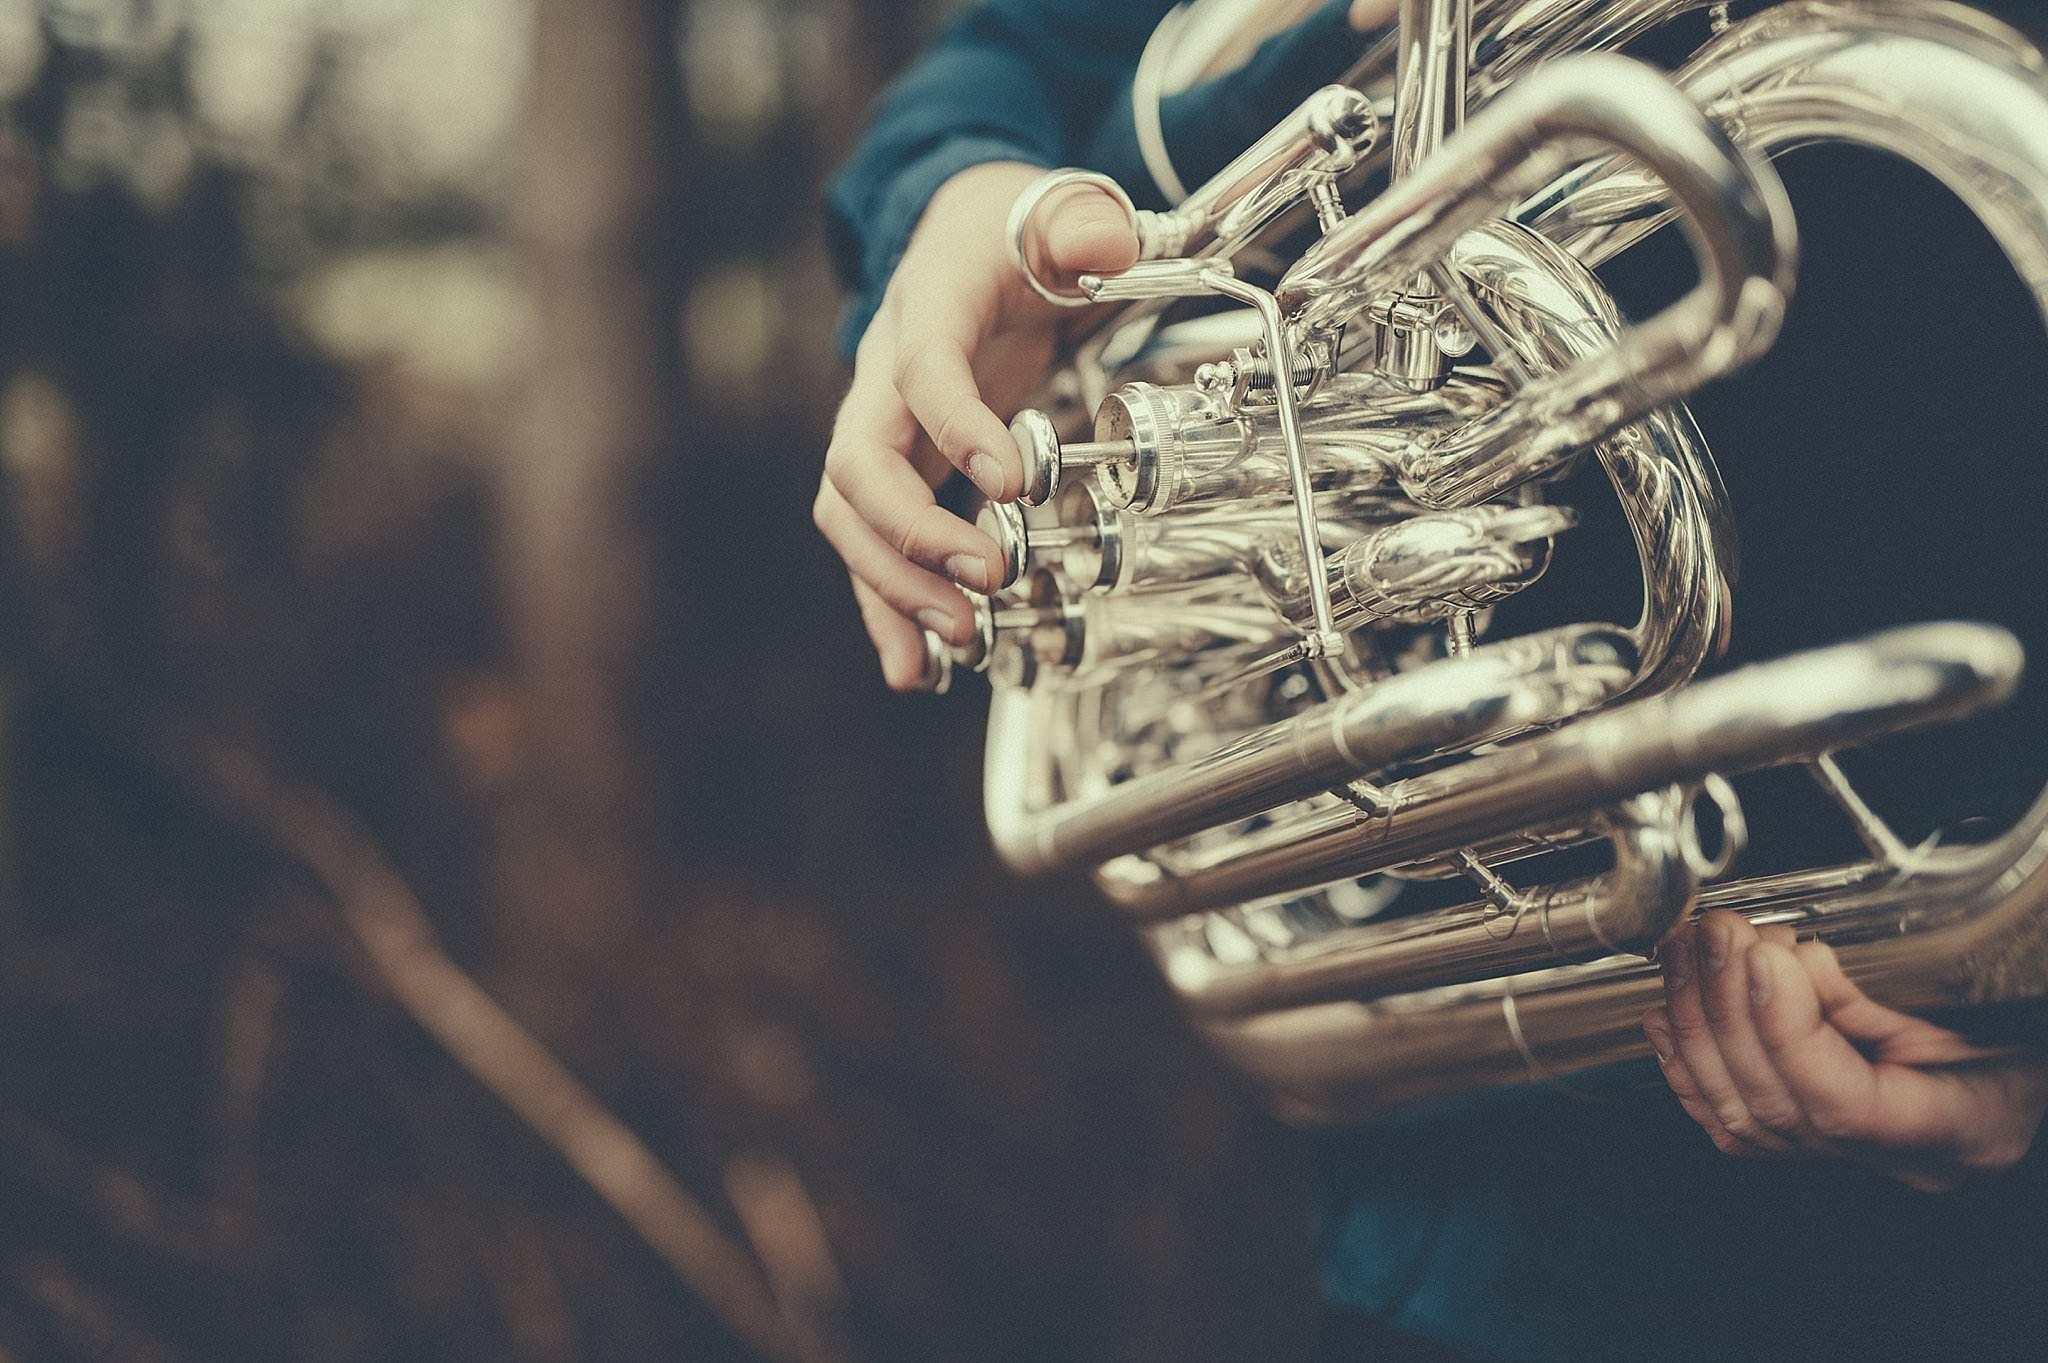 aga-tomaszek-music-photographer-cardiff_1311